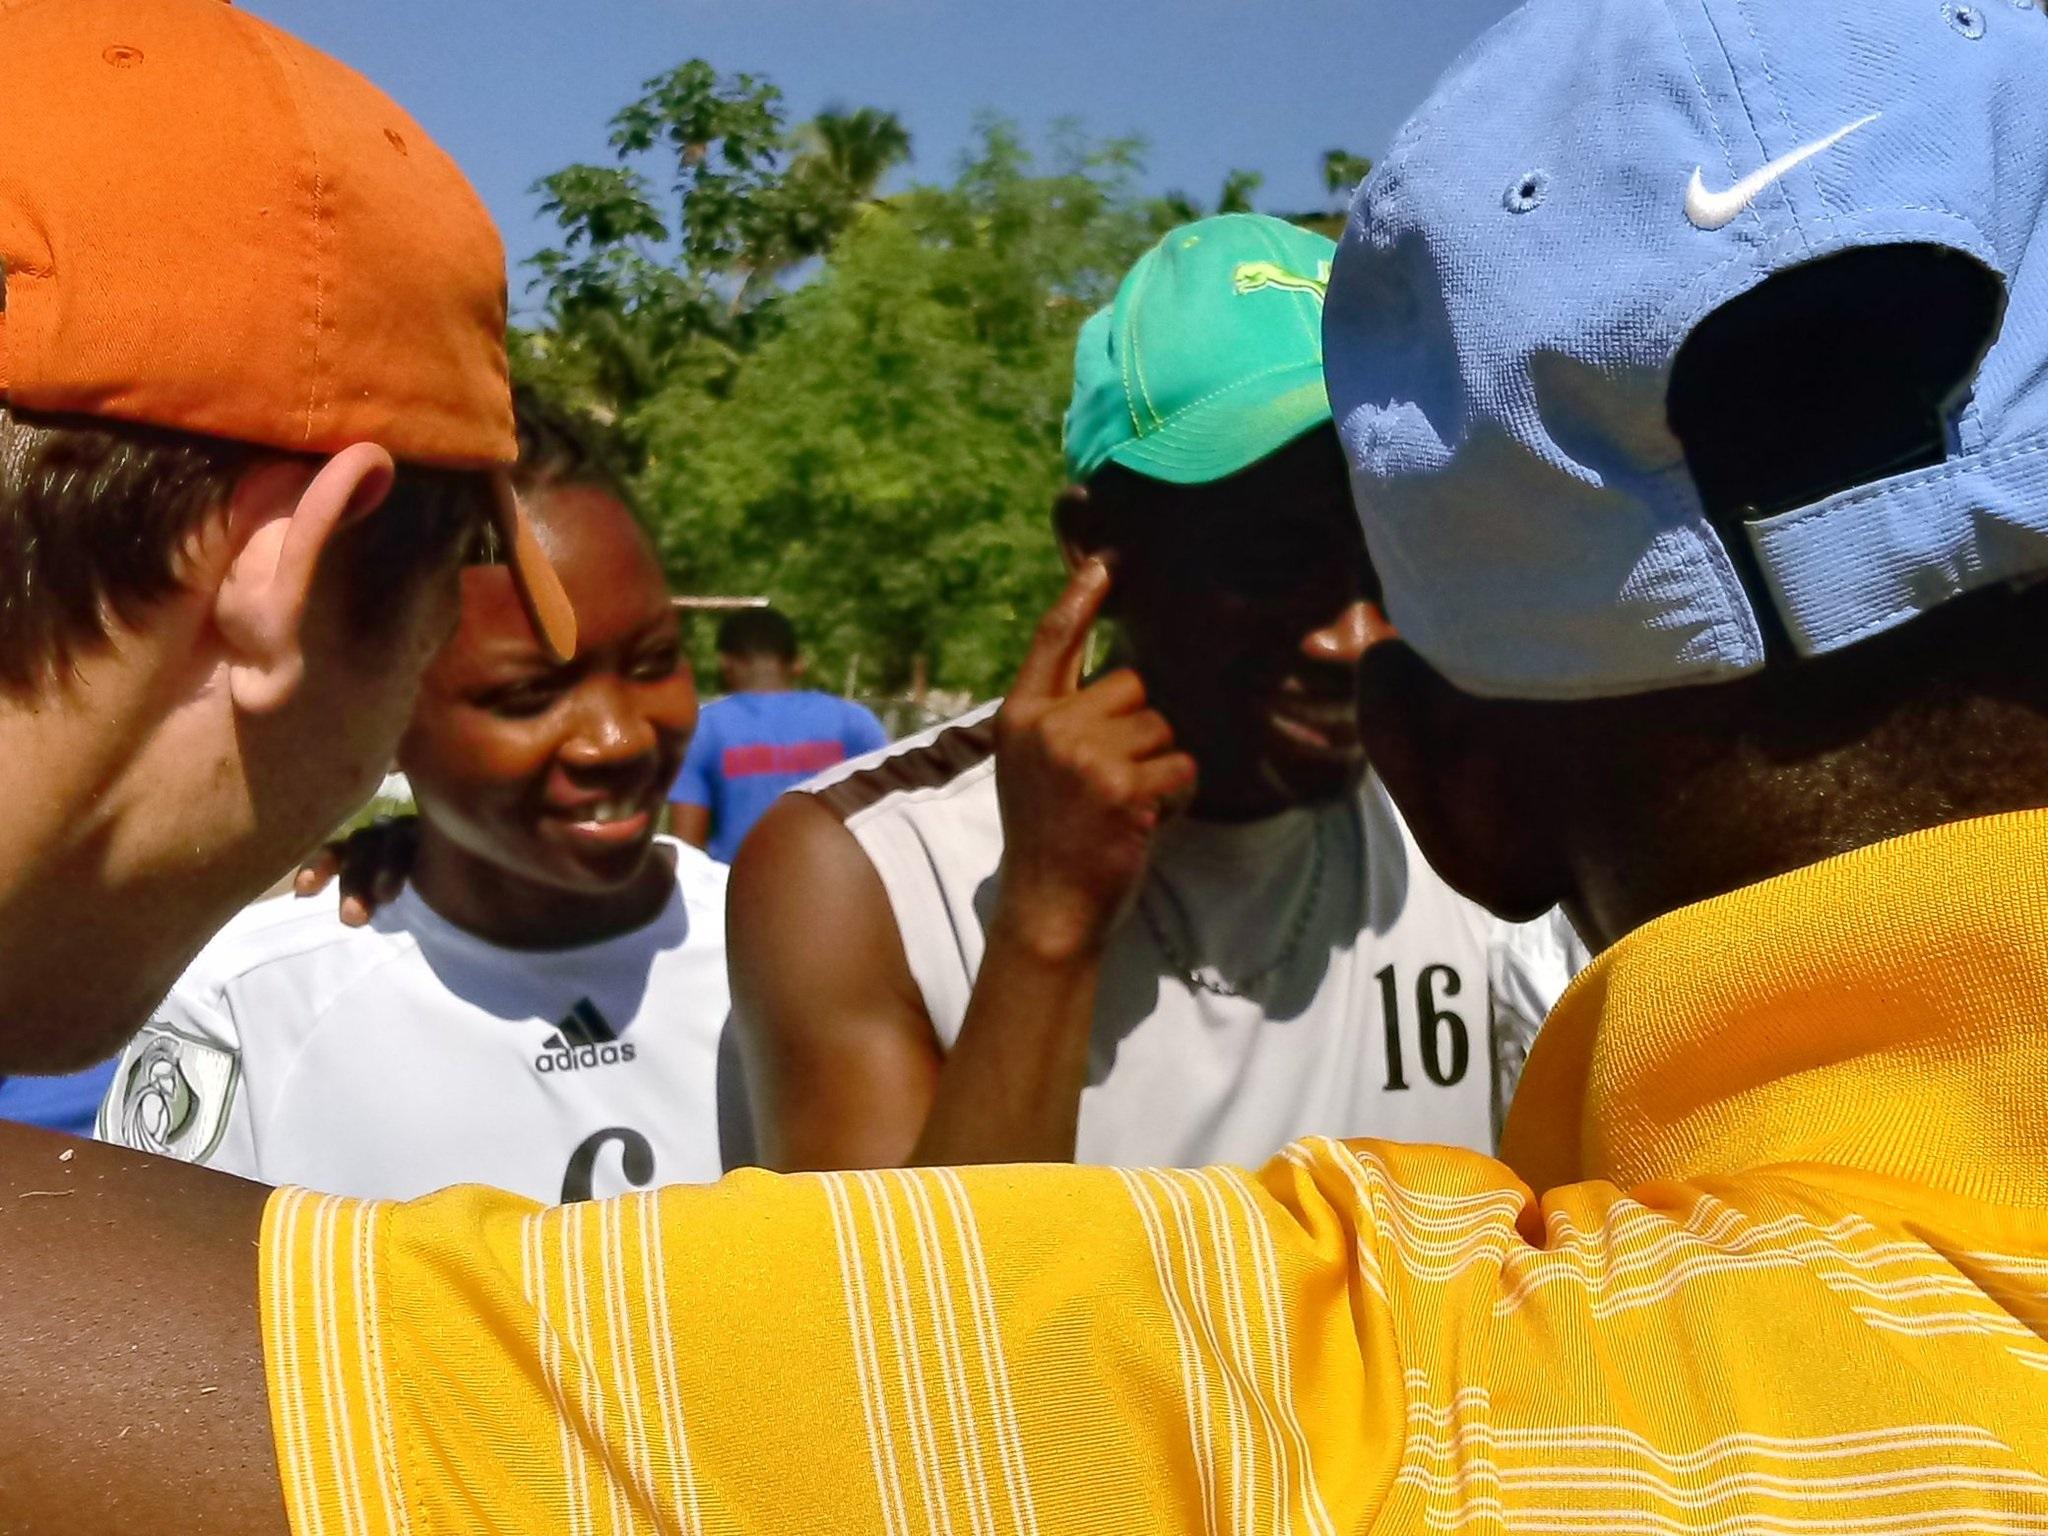 GOALS Haiti soccer players